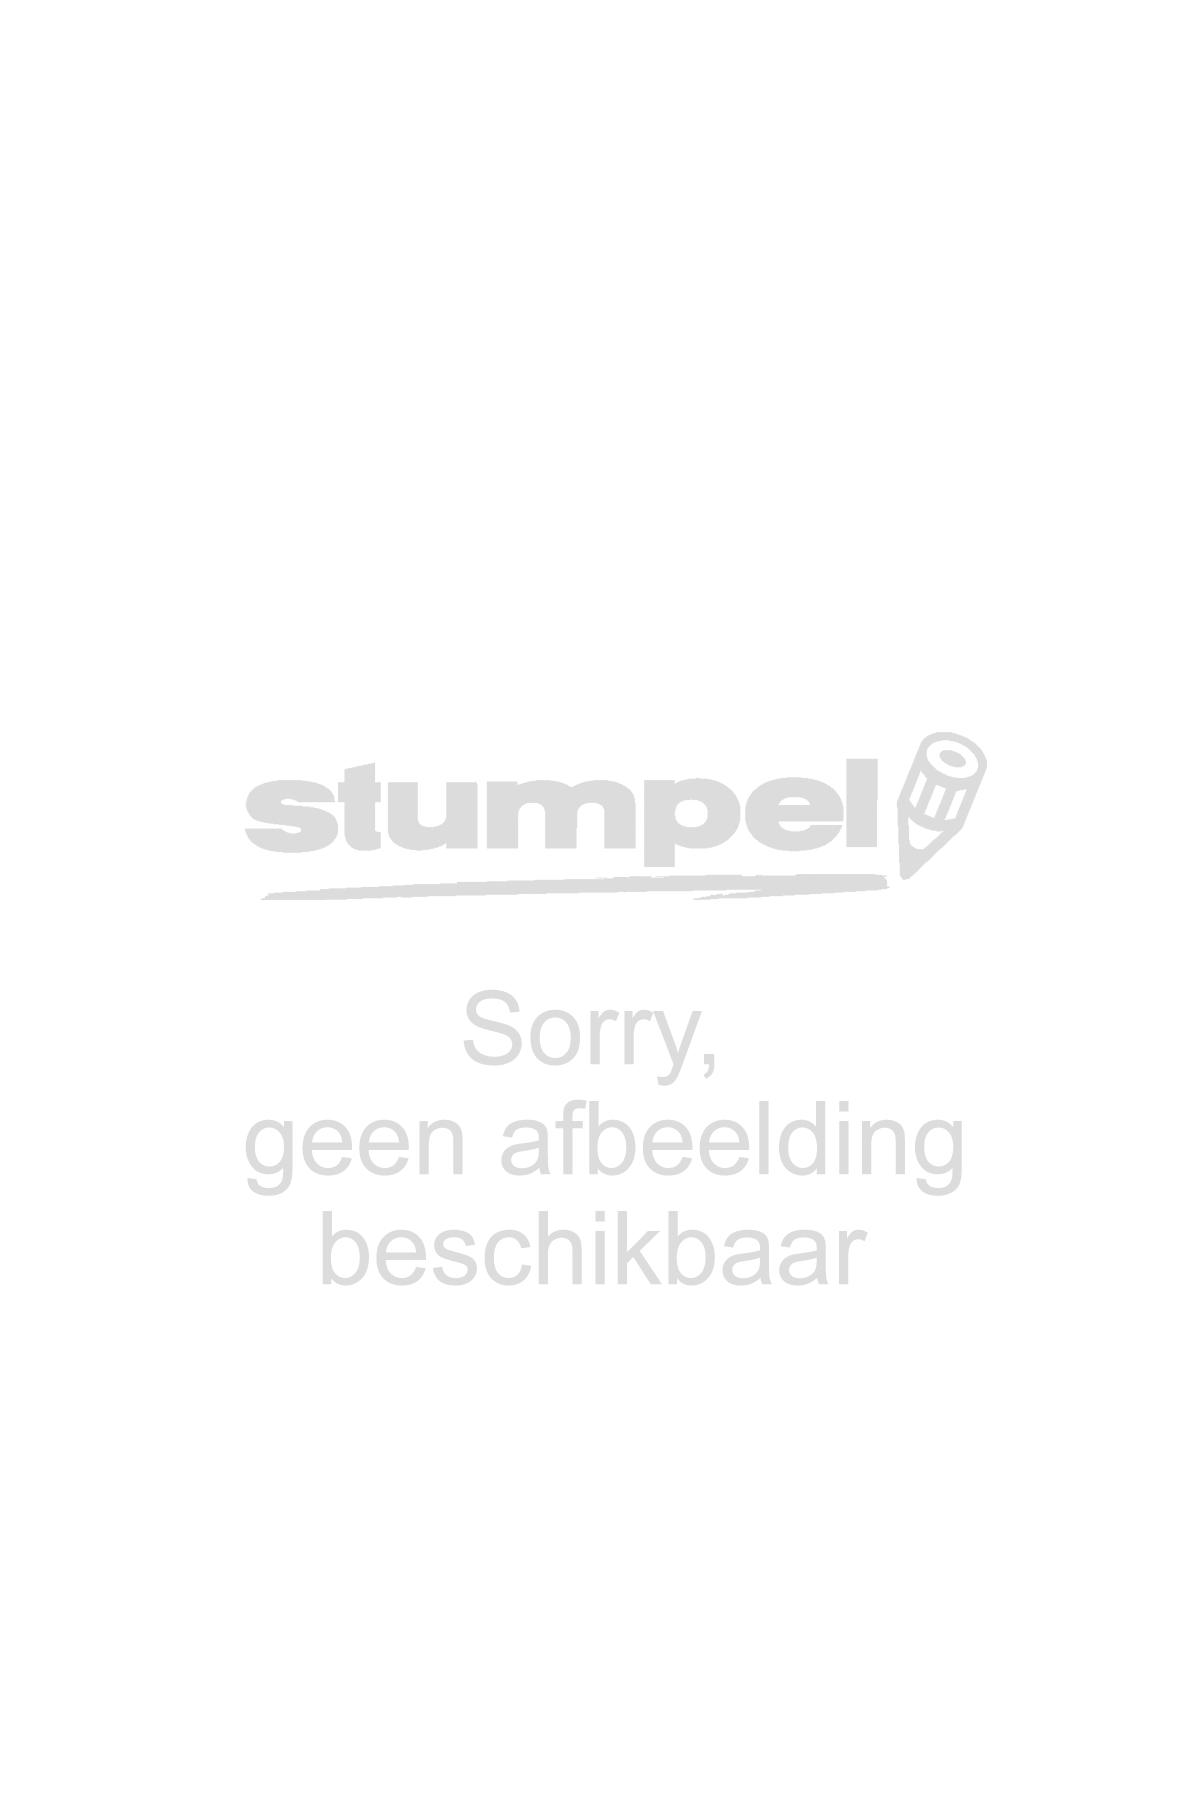 balpen-schneider-k20-icy-colors-zwart-106381